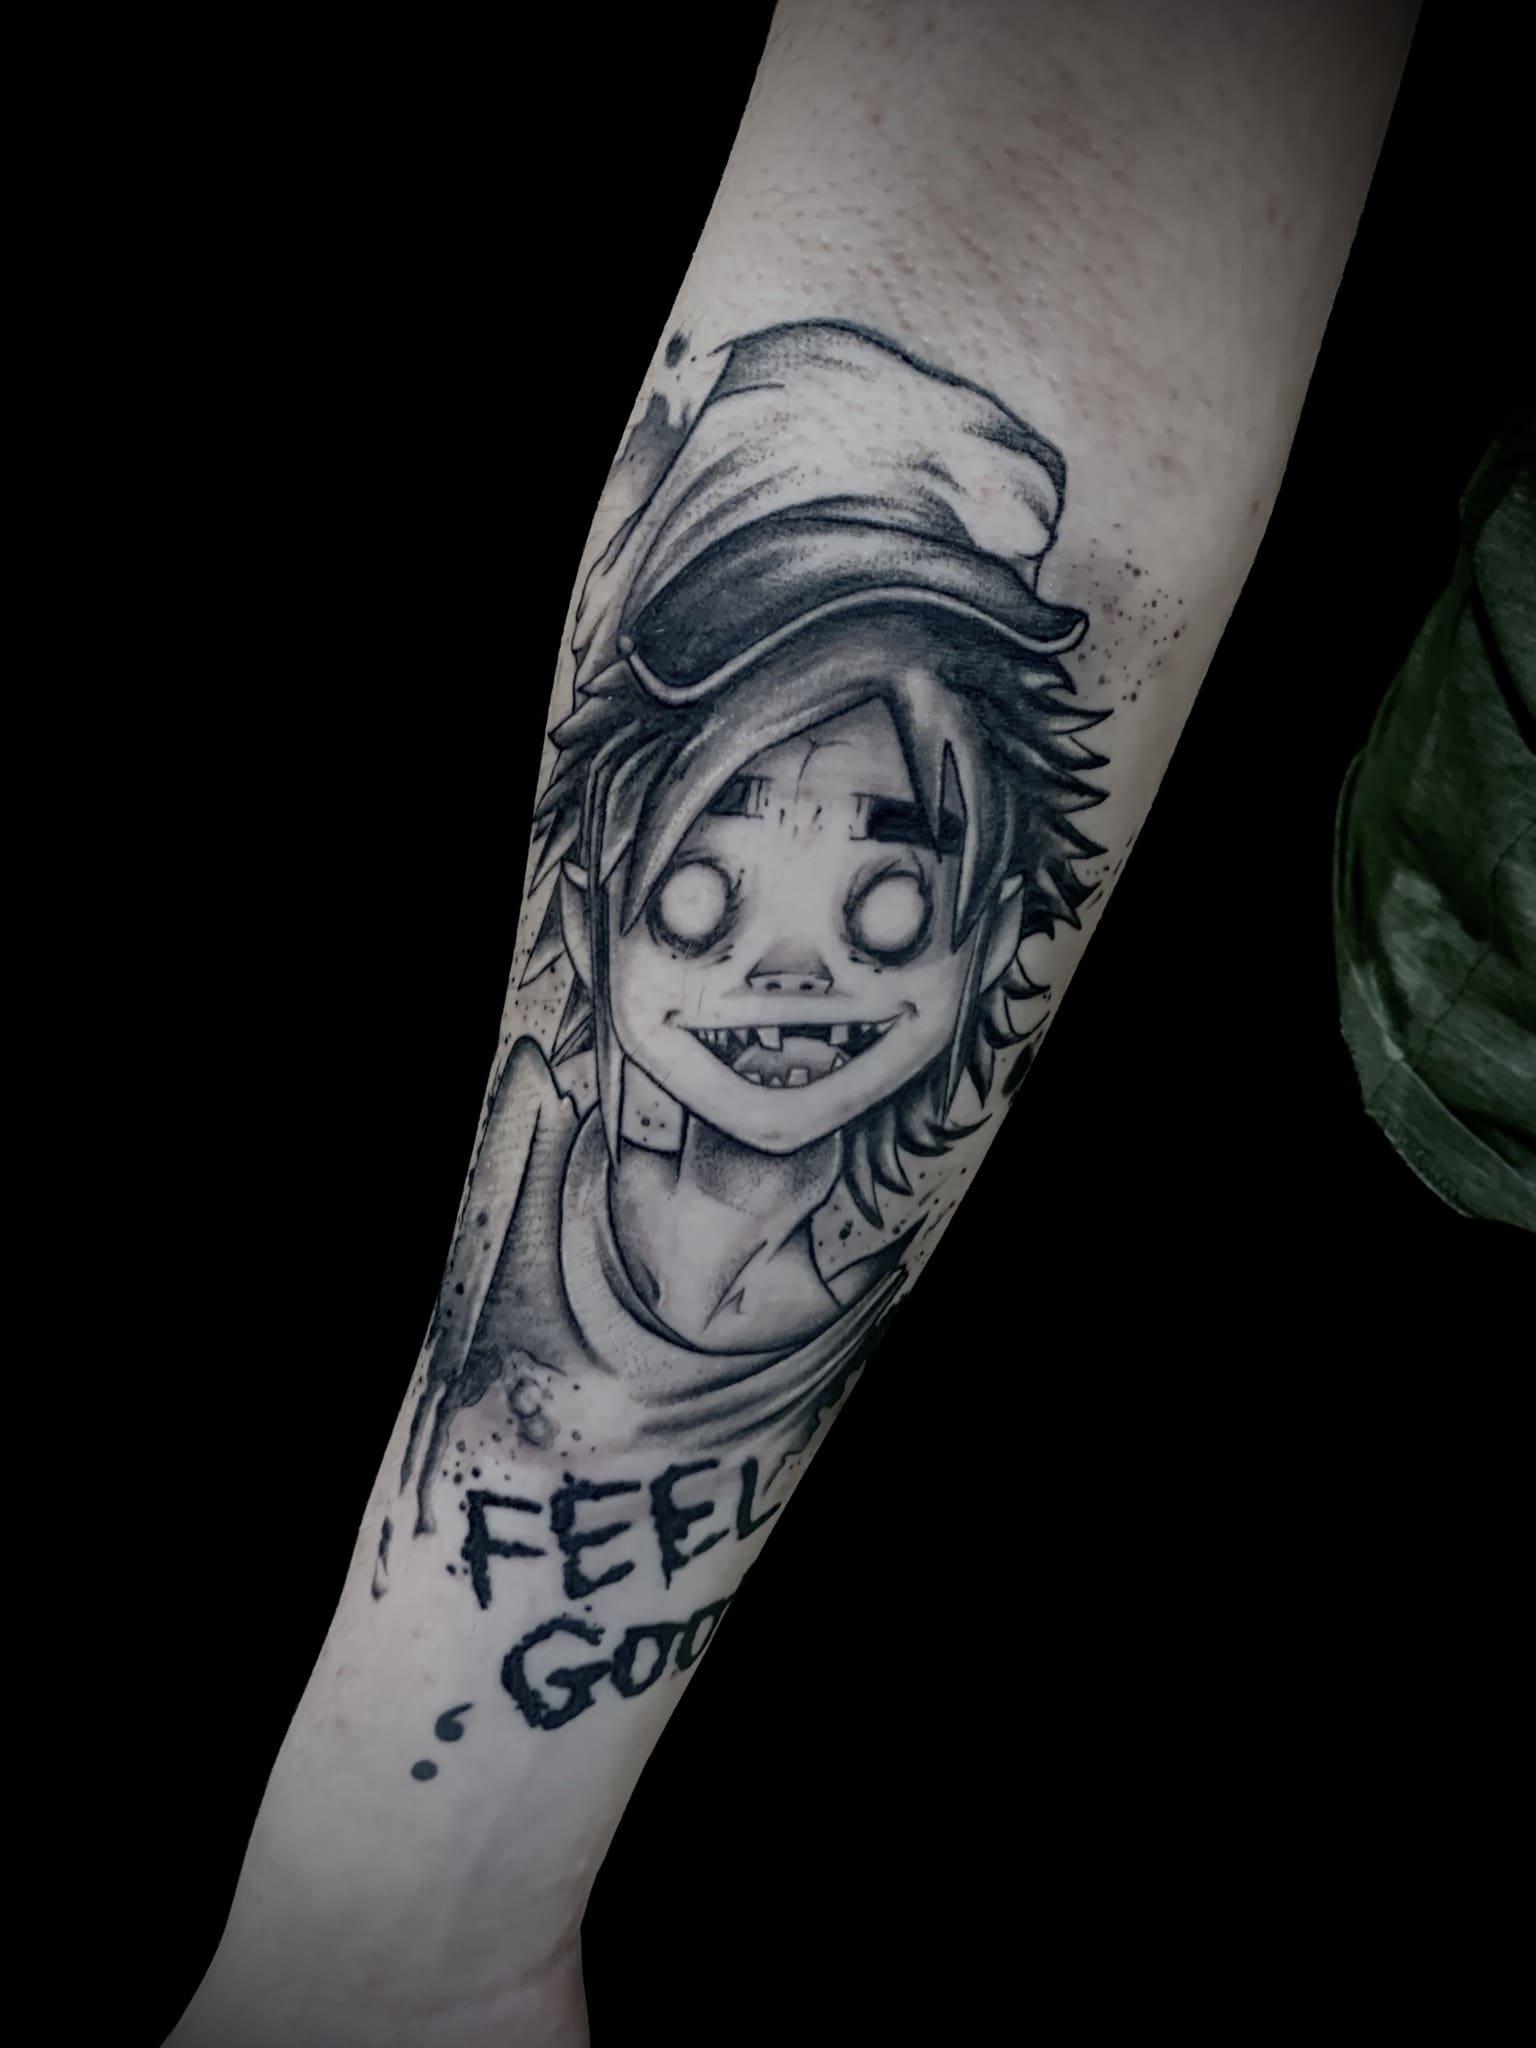 Tattoo Anansi München Artist David blackwork sketch neotraditional portrait gorillaz band fan